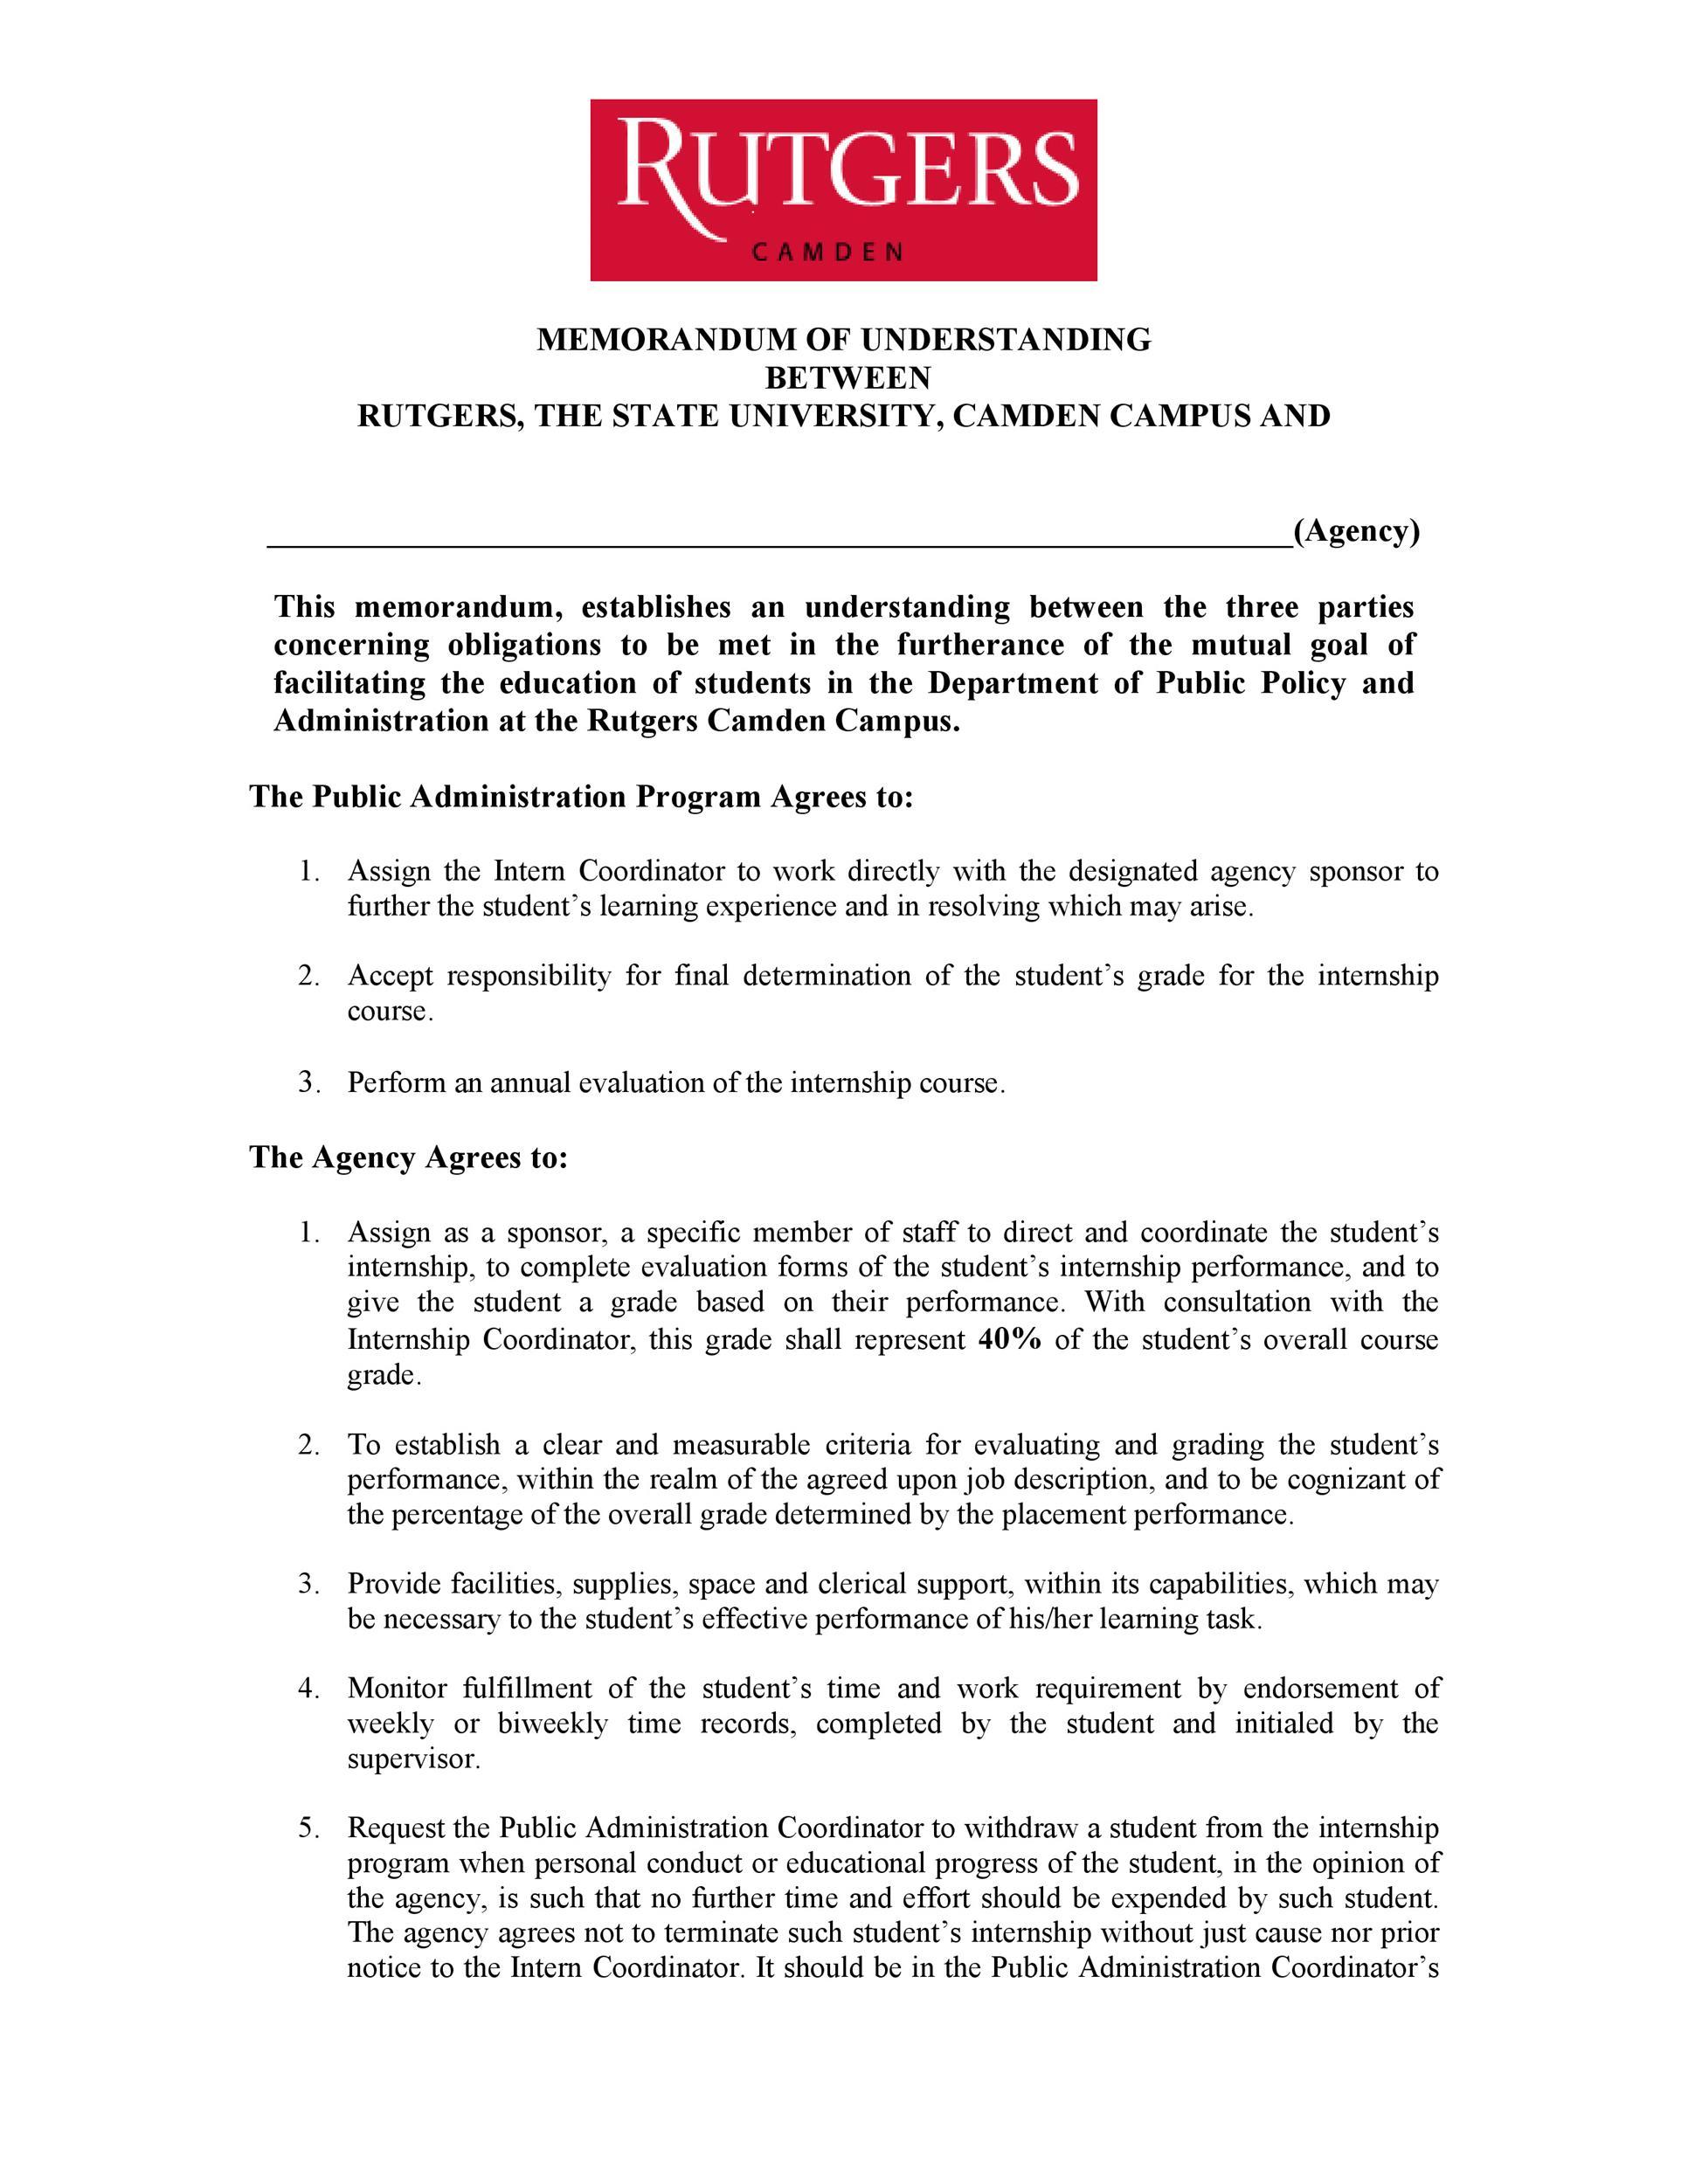 Free Memorandum of Understanding Template 31